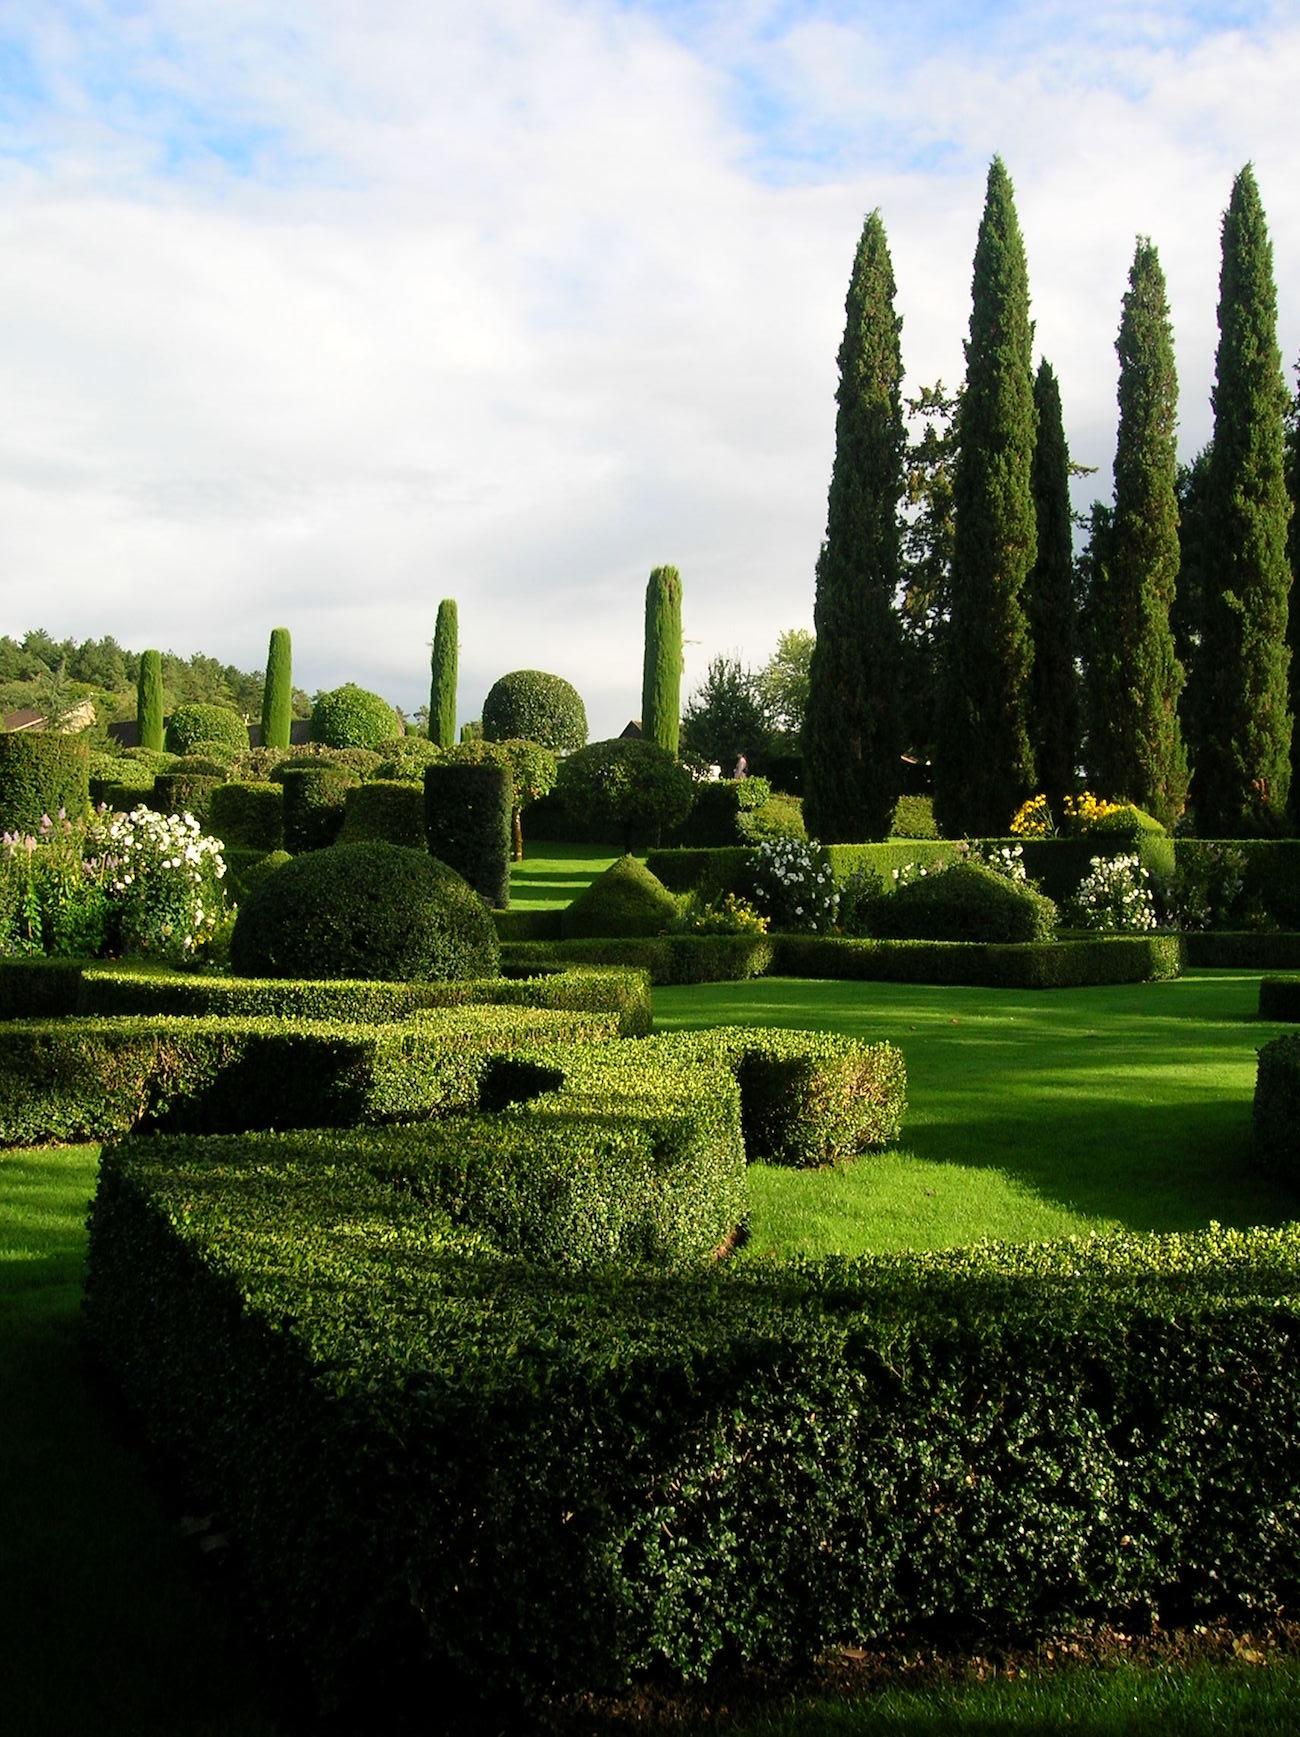 Cyprus Trees Provence.JPG